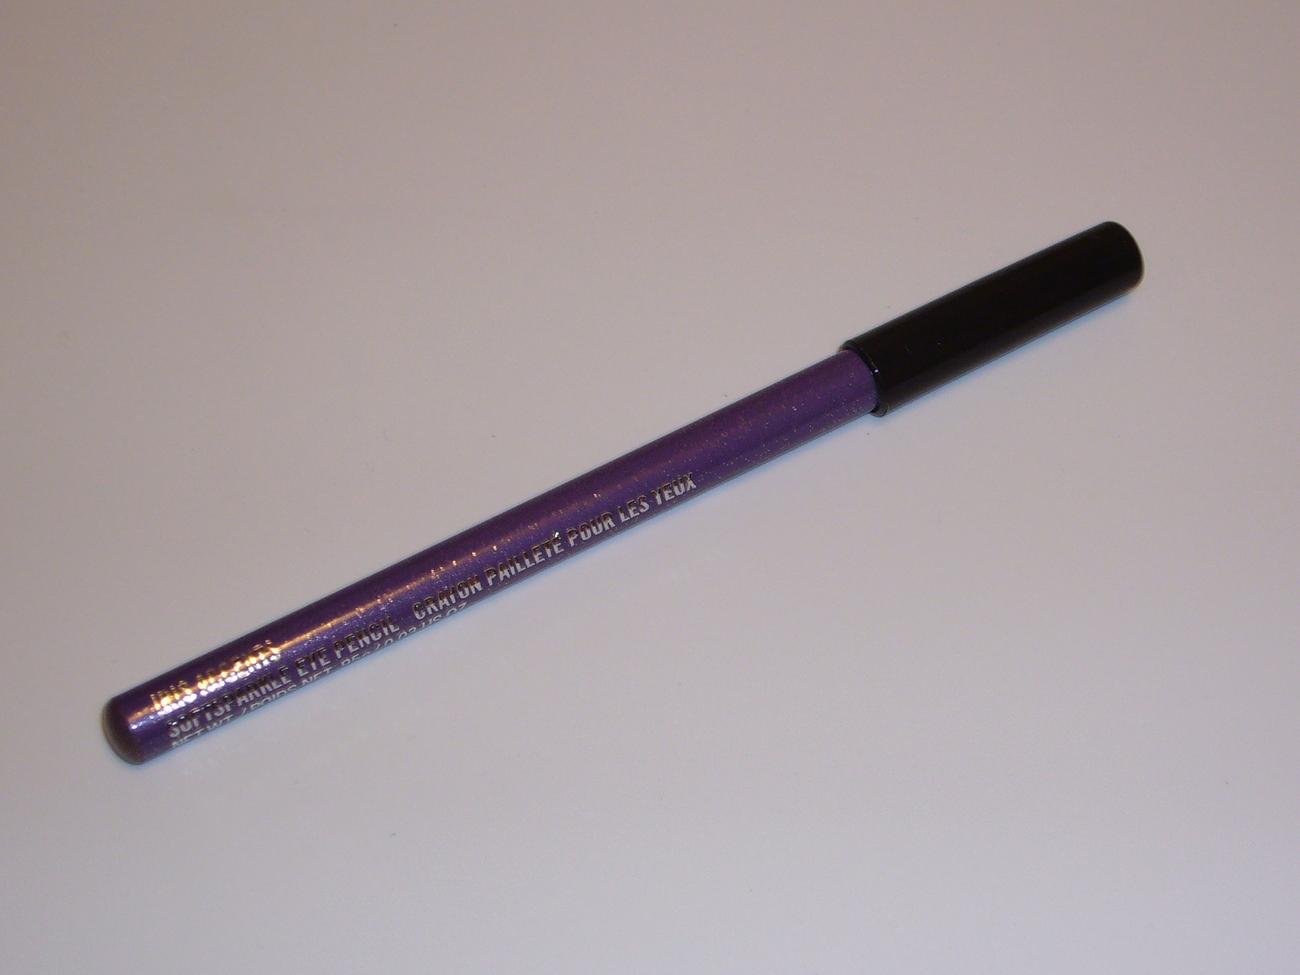 MAC Cosmetics Soft Sparkle Eye Liner Pencil Iris Accents Vio Bonanza